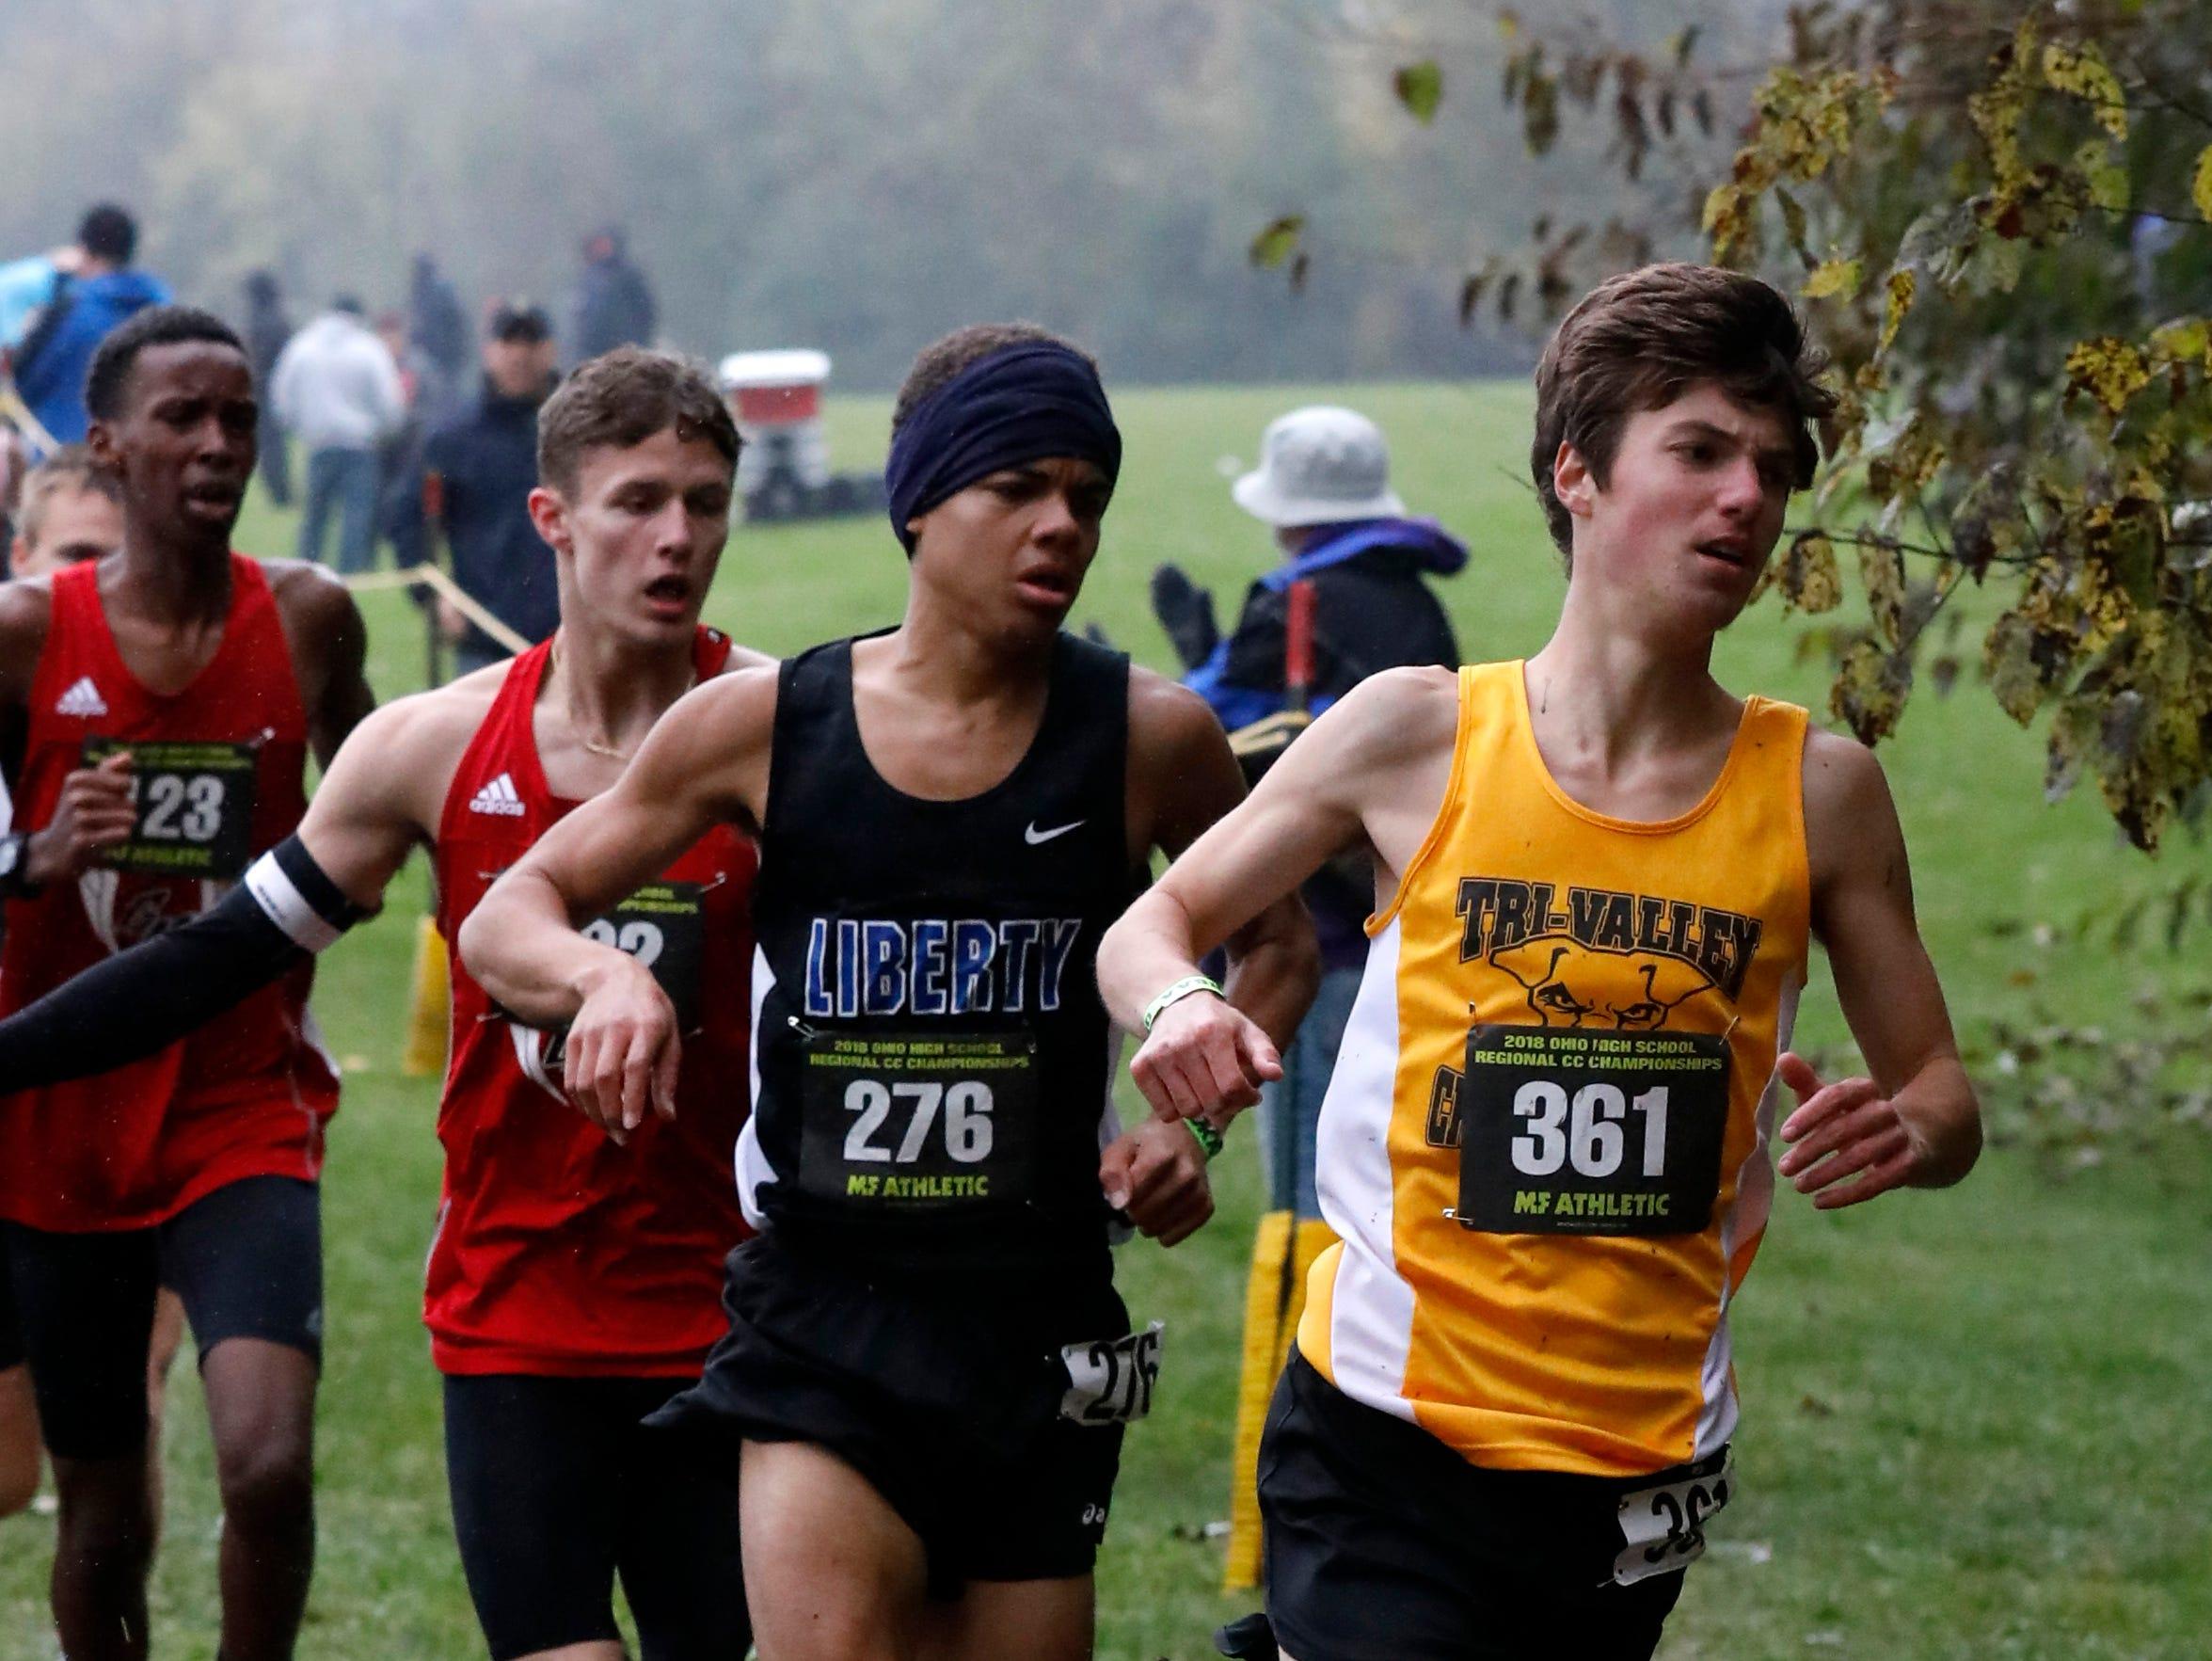 Tri-Valley's Ryan Meadows runs in the Regional Cross Country meet Saturday, Oct. 27, 2018, at Pickerington North High School in Pickerington.